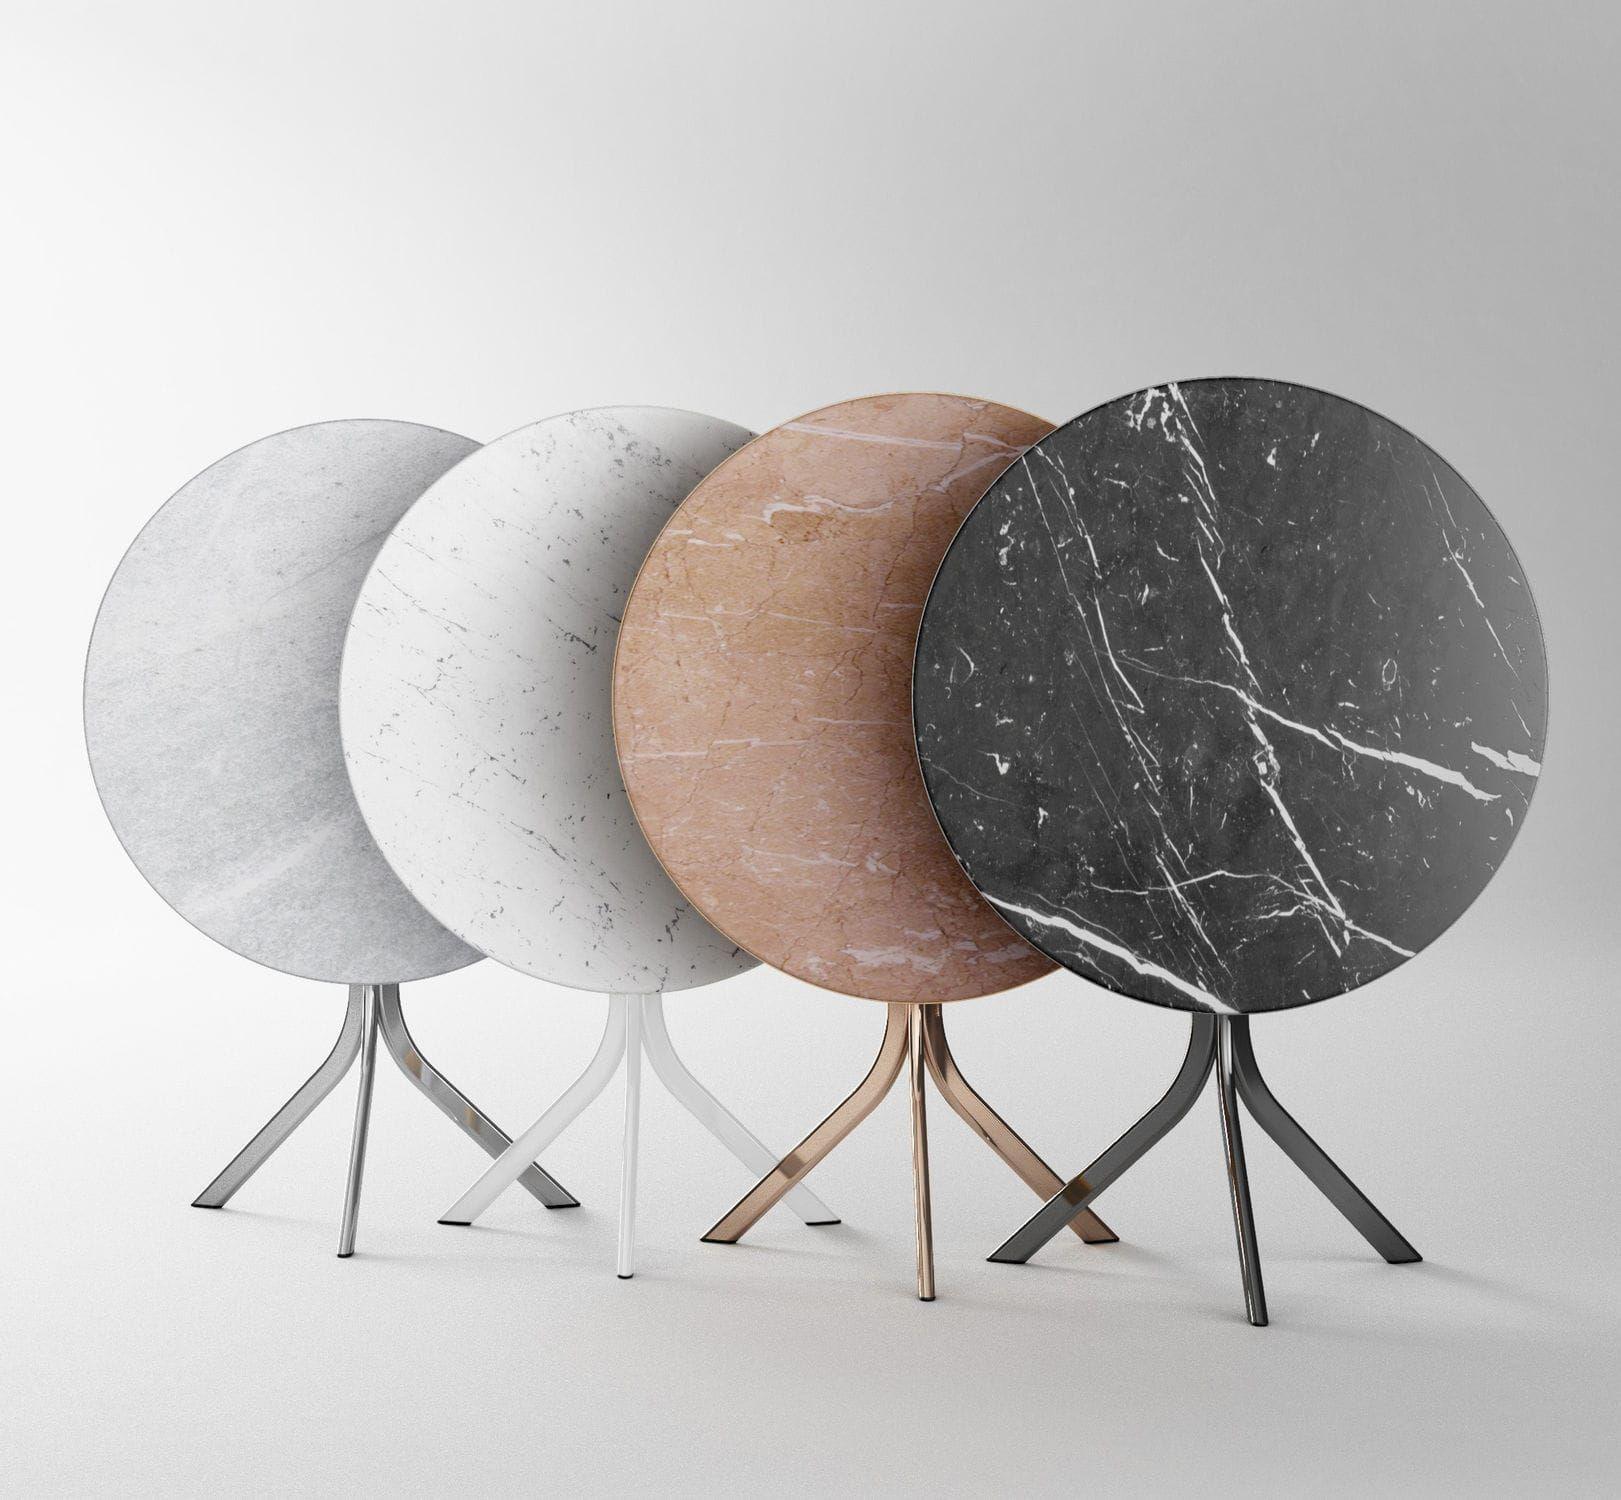 luxus table marbre bistrot id es de conception de table basse. Black Bedroom Furniture Sets. Home Design Ideas